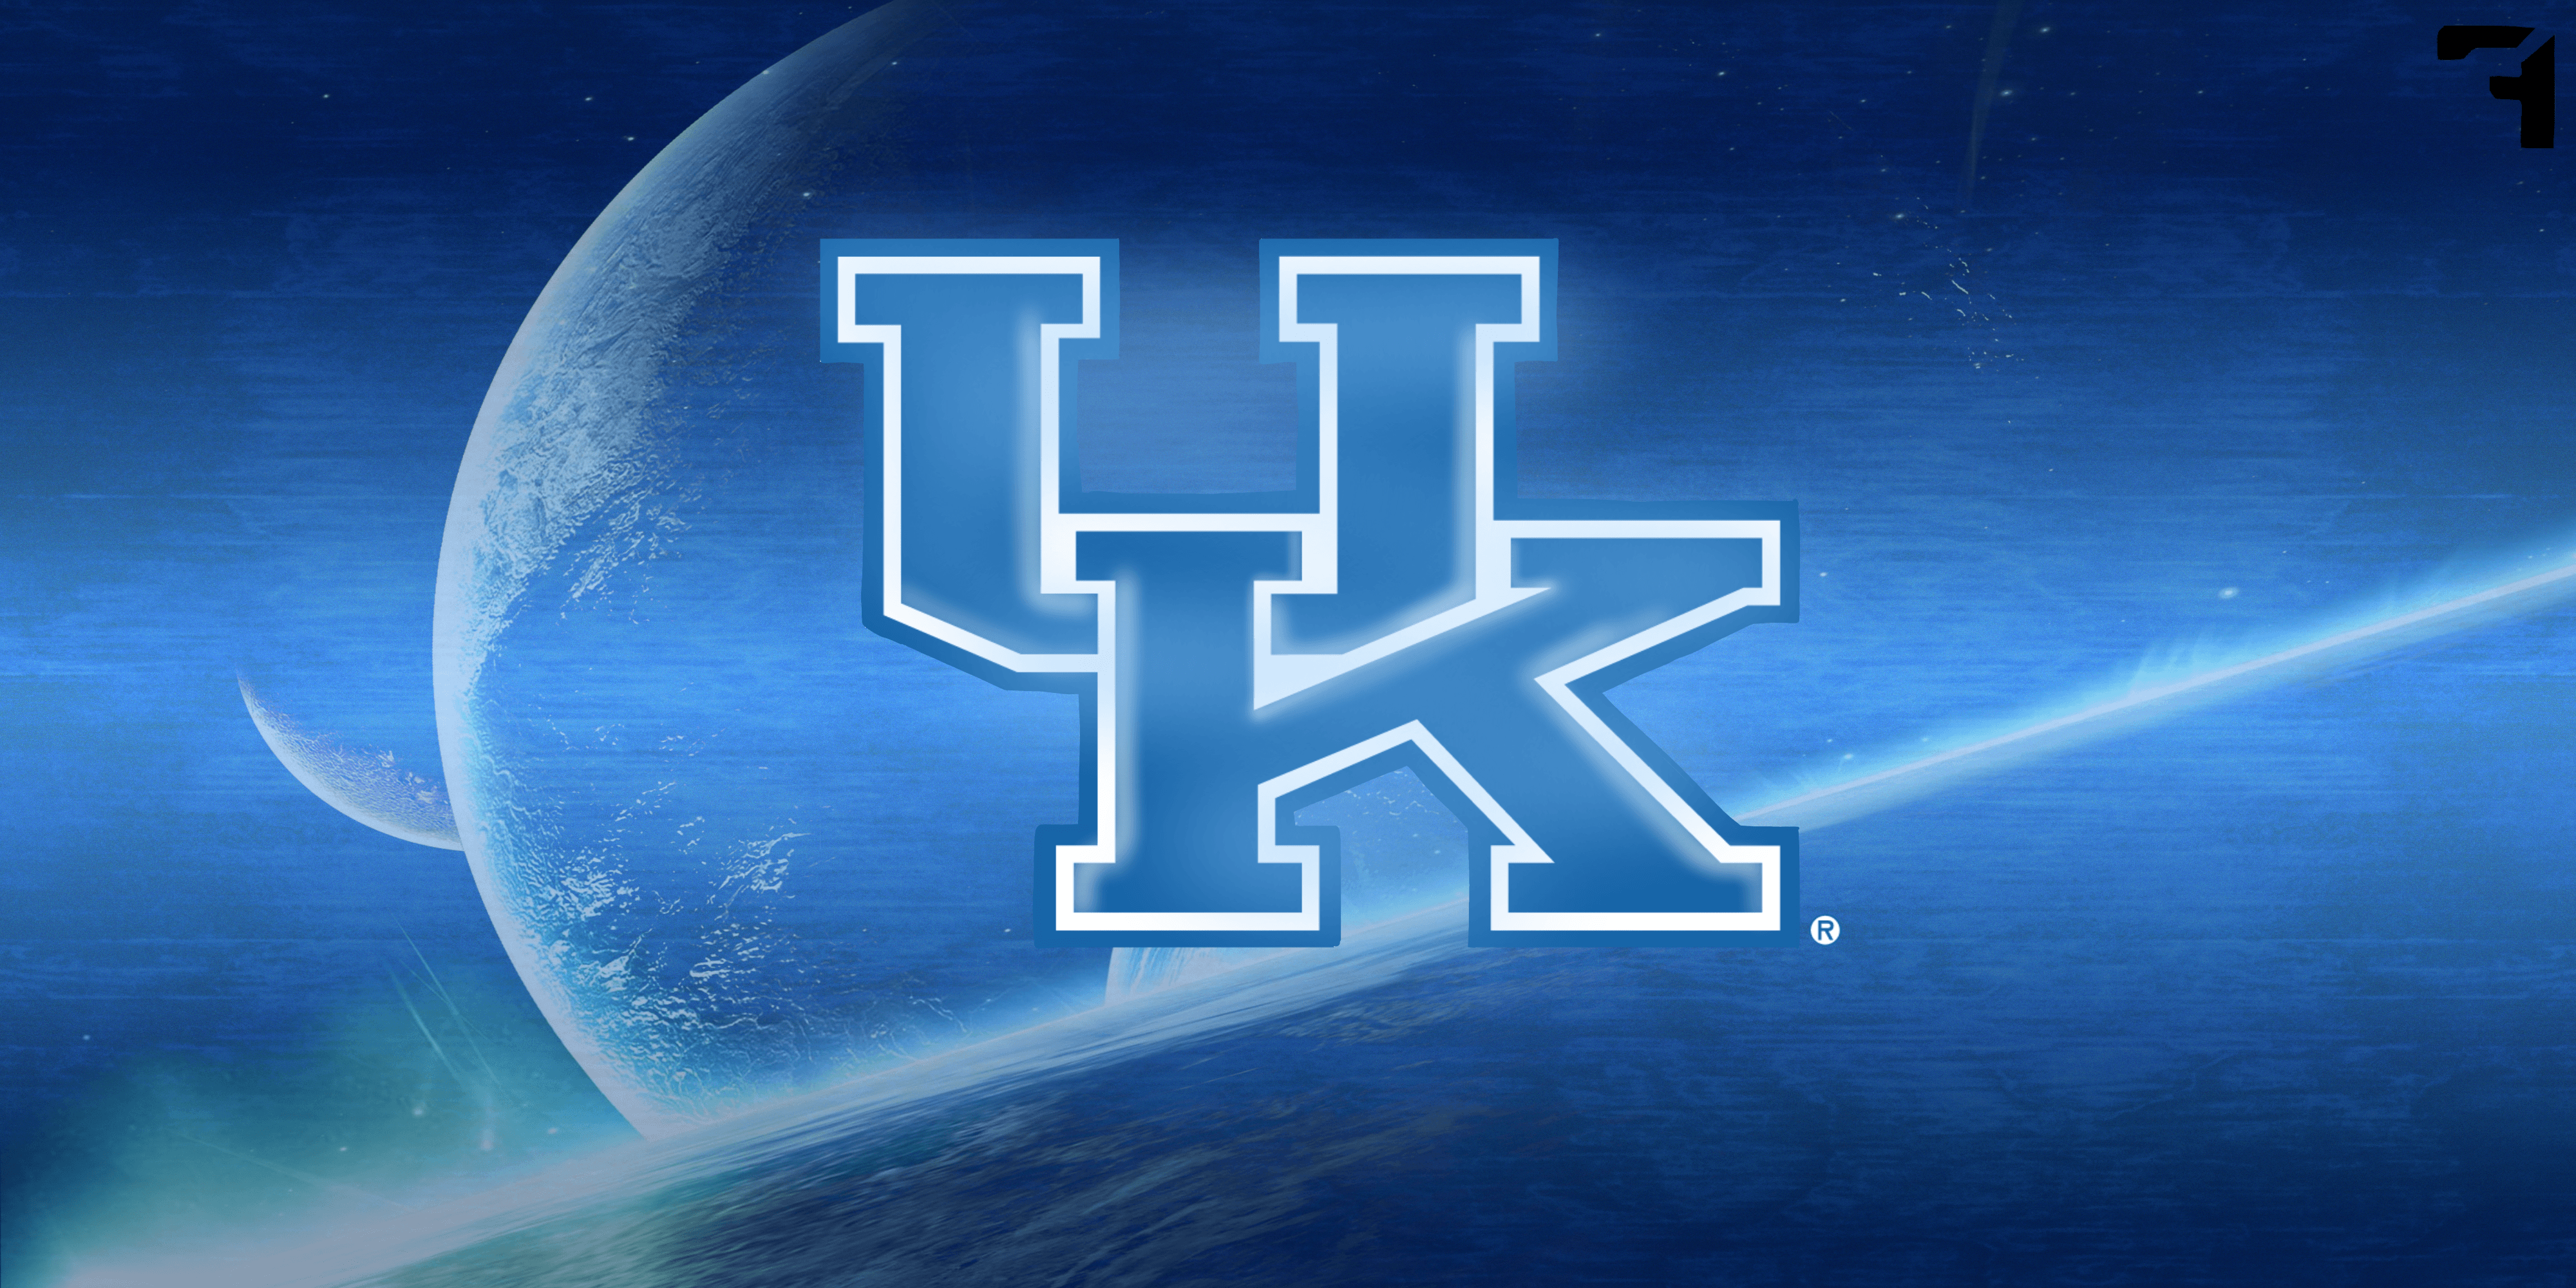 Plangton Wallpaper University Of Kentucky Wallpaper: University Of Kentucky Wallpapers